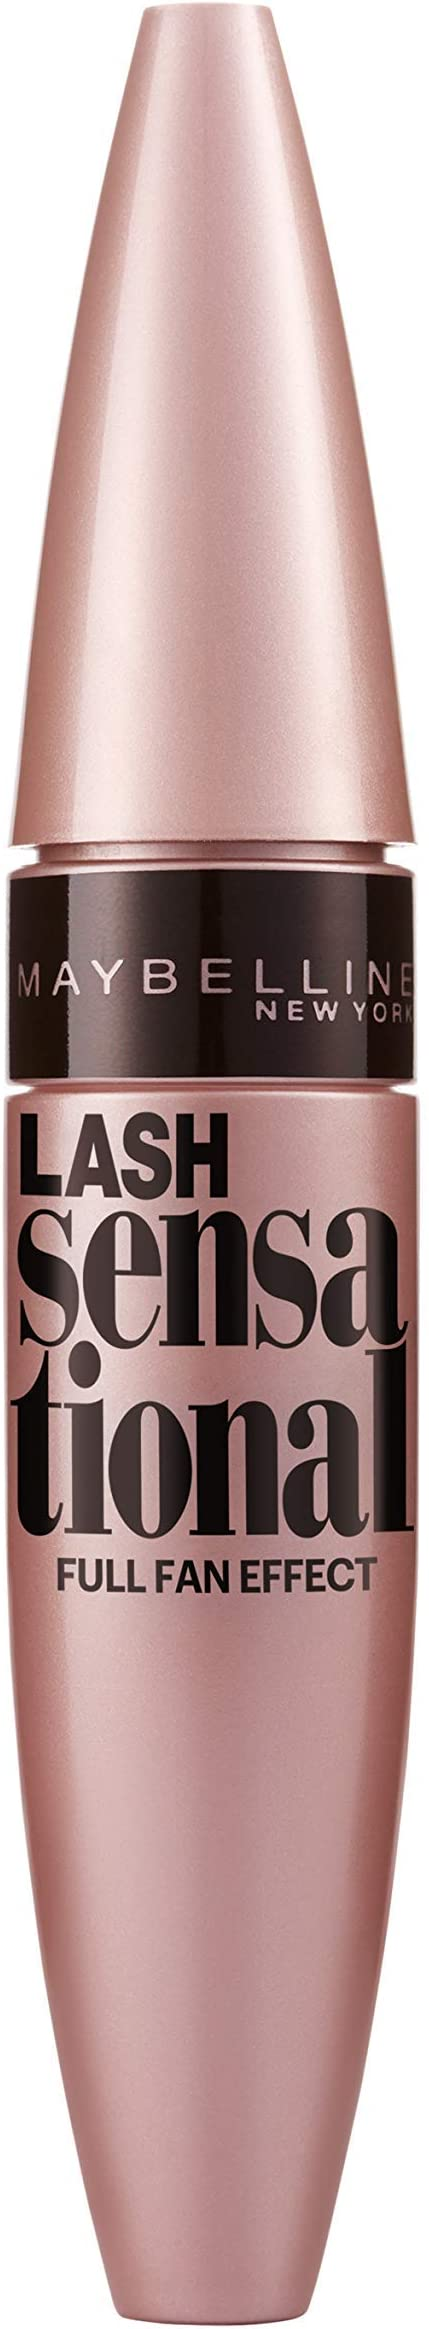 Maybelline Lash Sensational 01 Very Black Mascara,Maybelline,3600531143459